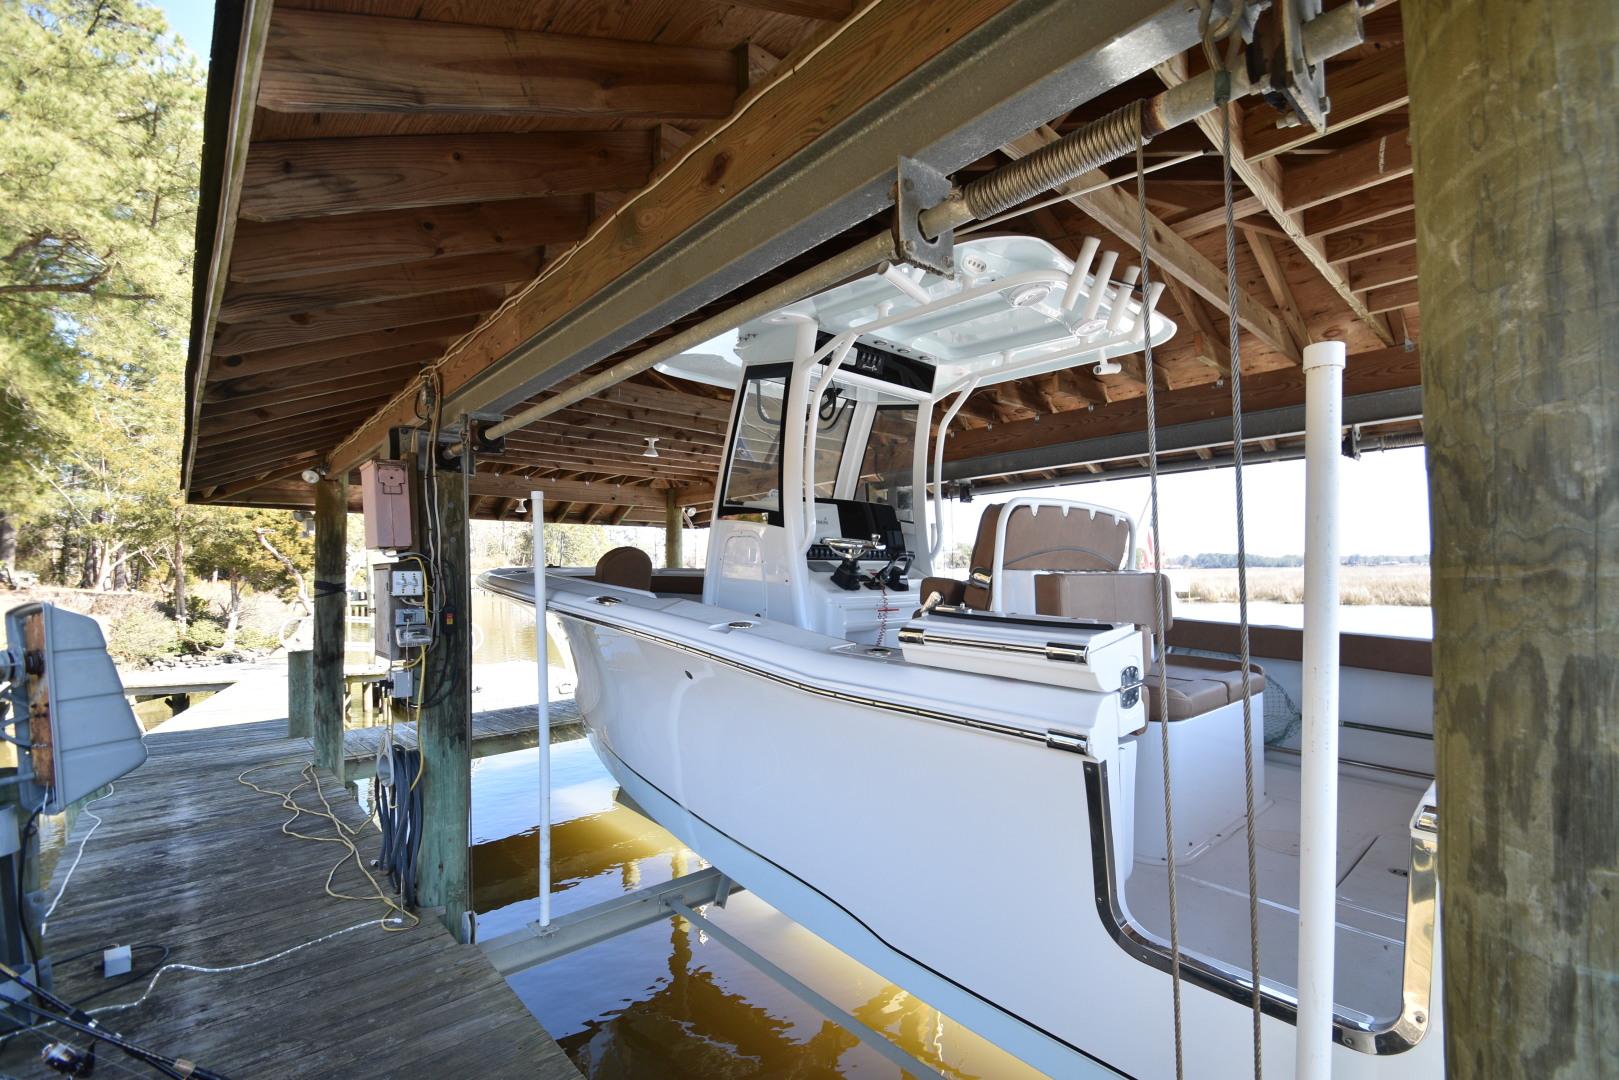 Sea Hunt-27 Gamefish 2020 -Chuckatuck-Virginia-United States-1628786 | Thumbnail